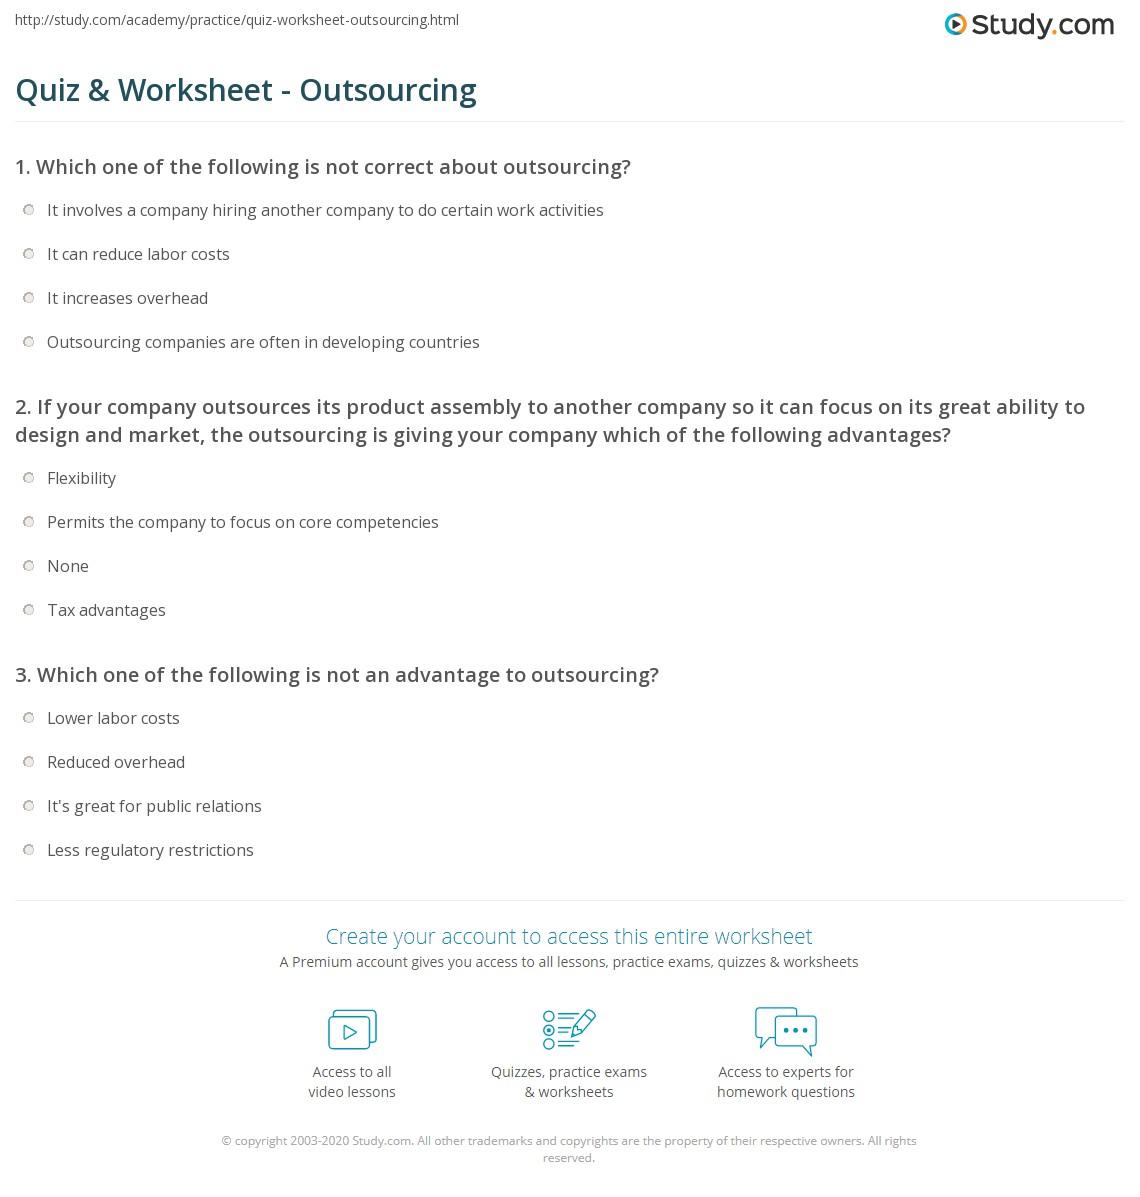 Quiz & Worksheet - Outsourcing   Study.com